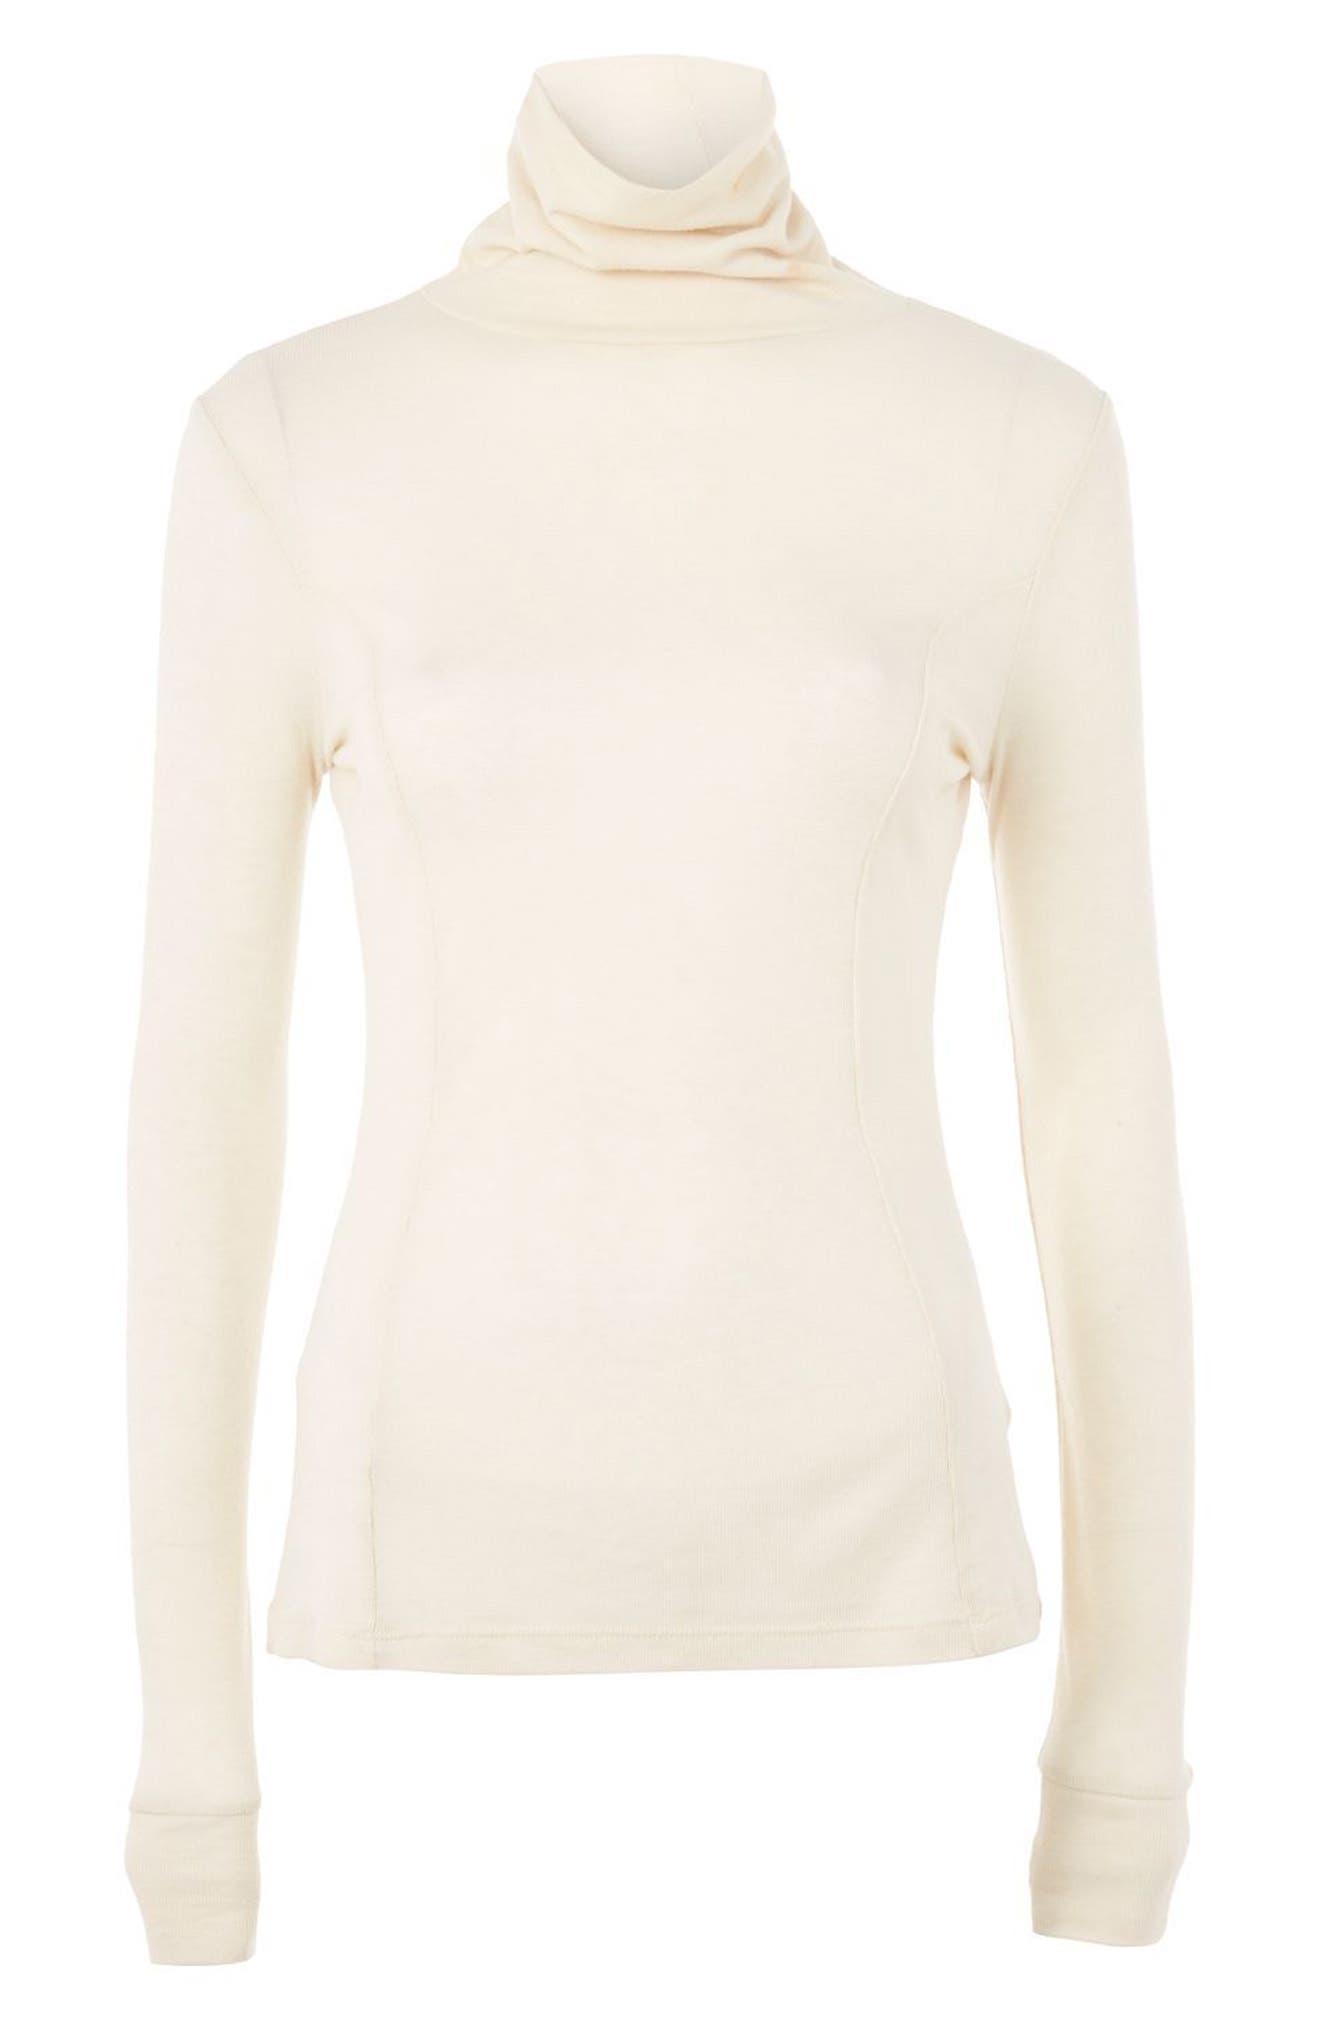 Alternate Image 1 Selected - Topshop Boutique Wool Turtleneck Sweater